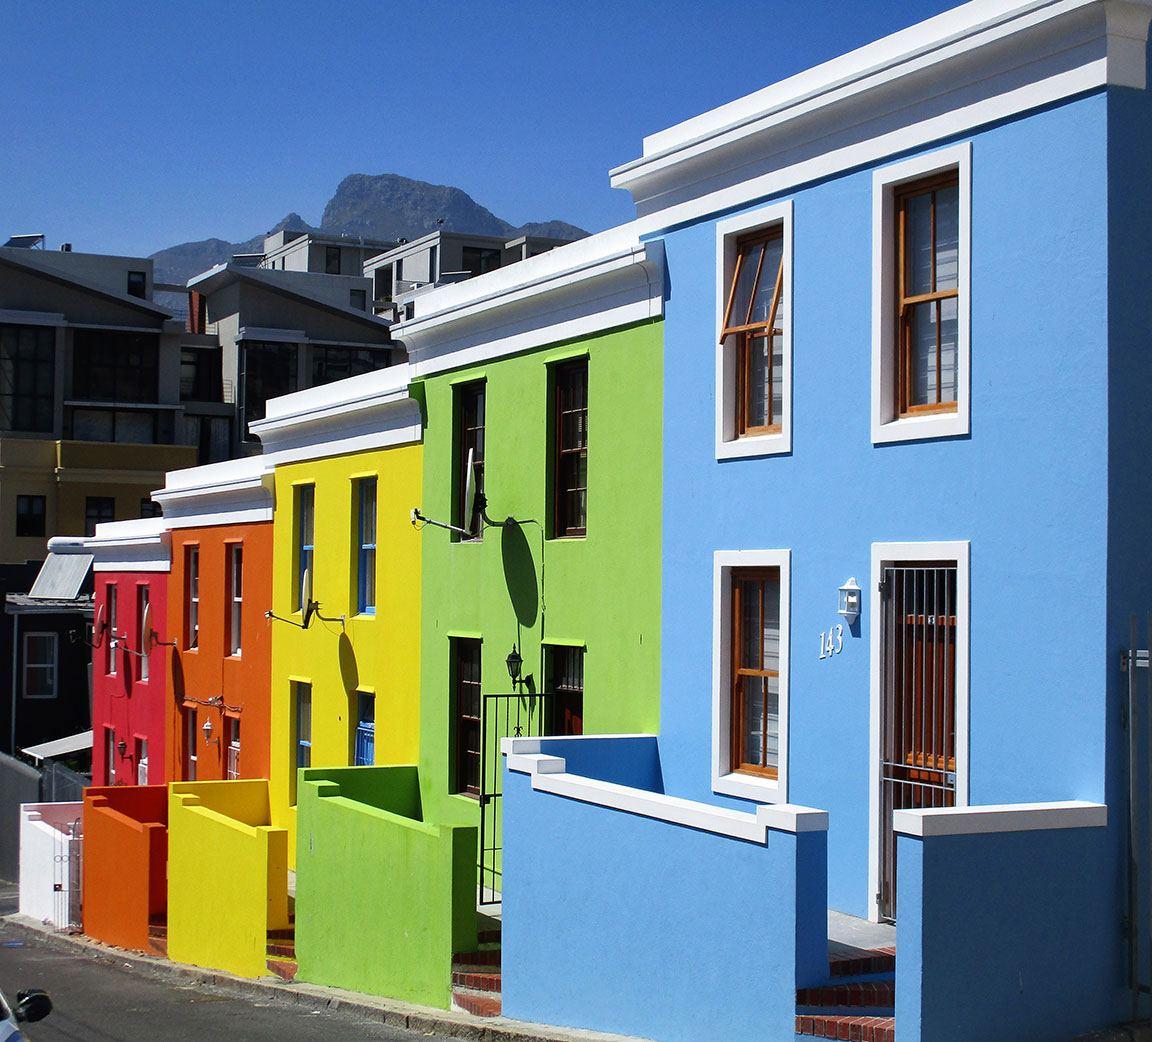 colorful houses Bo-Kapp neighborhood